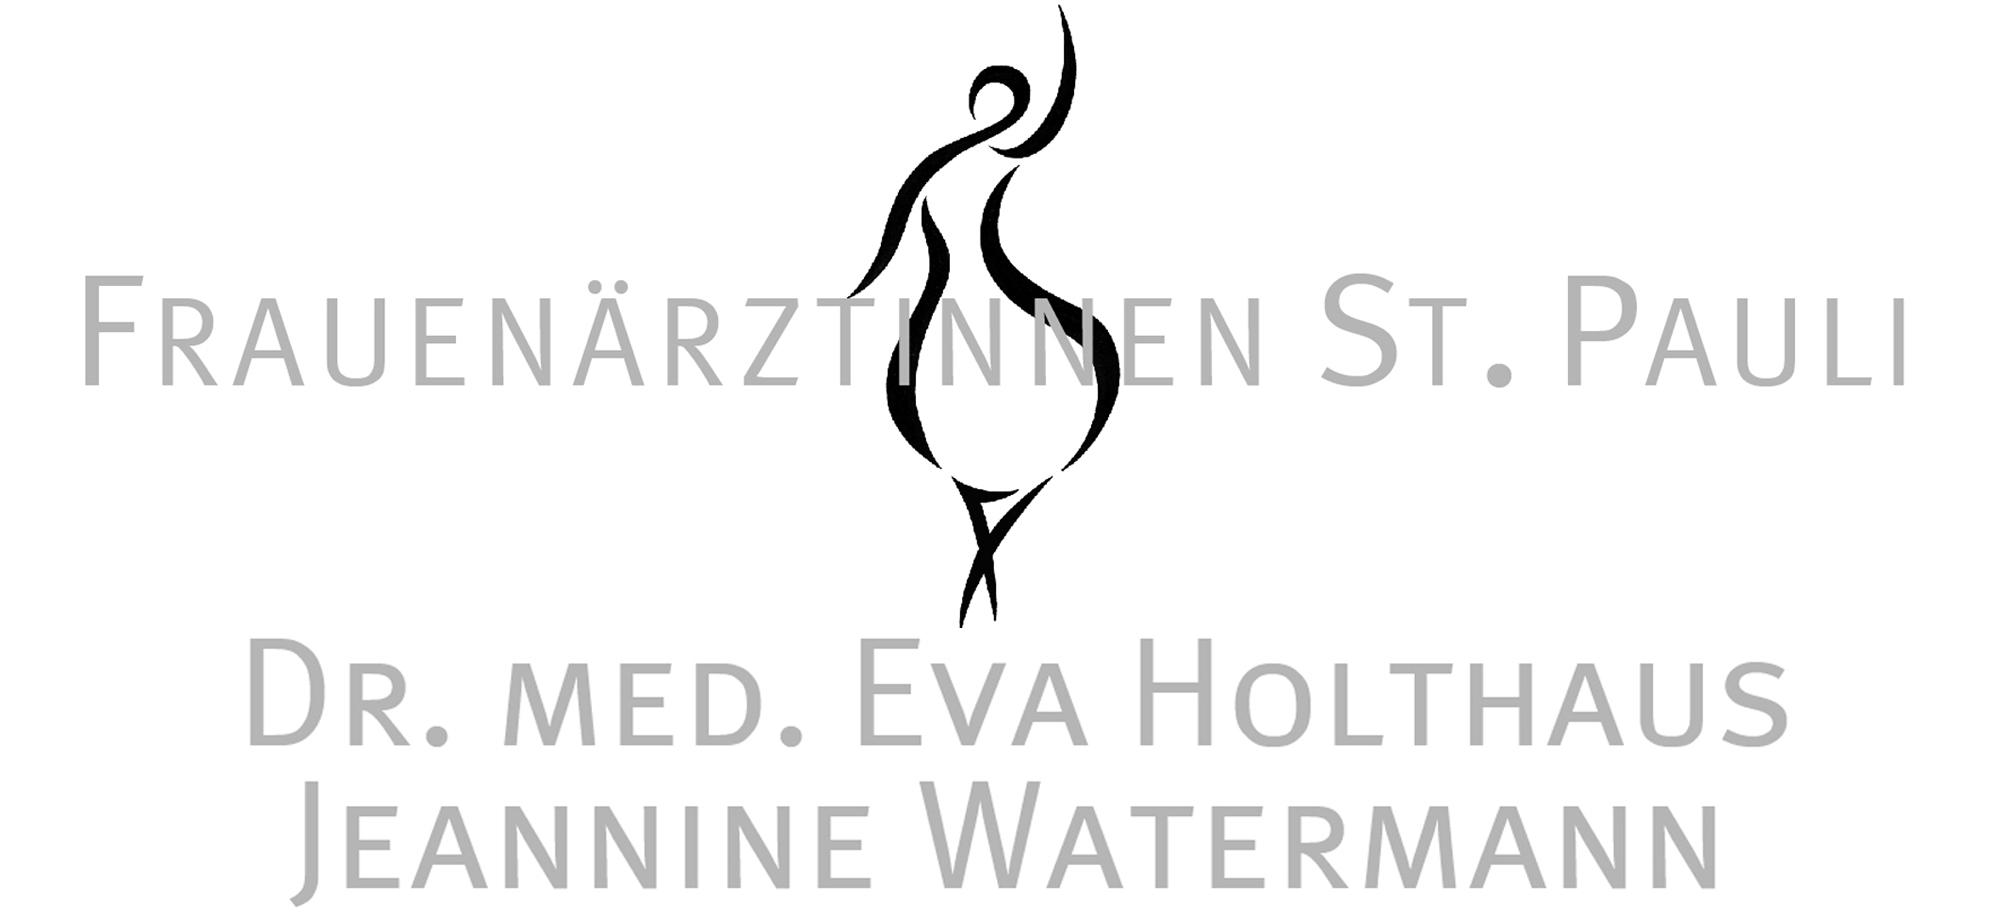 Frauenarztpraxis Hamburg St. Pauli - Frauenarztpraxis Hamburg St. Pauli